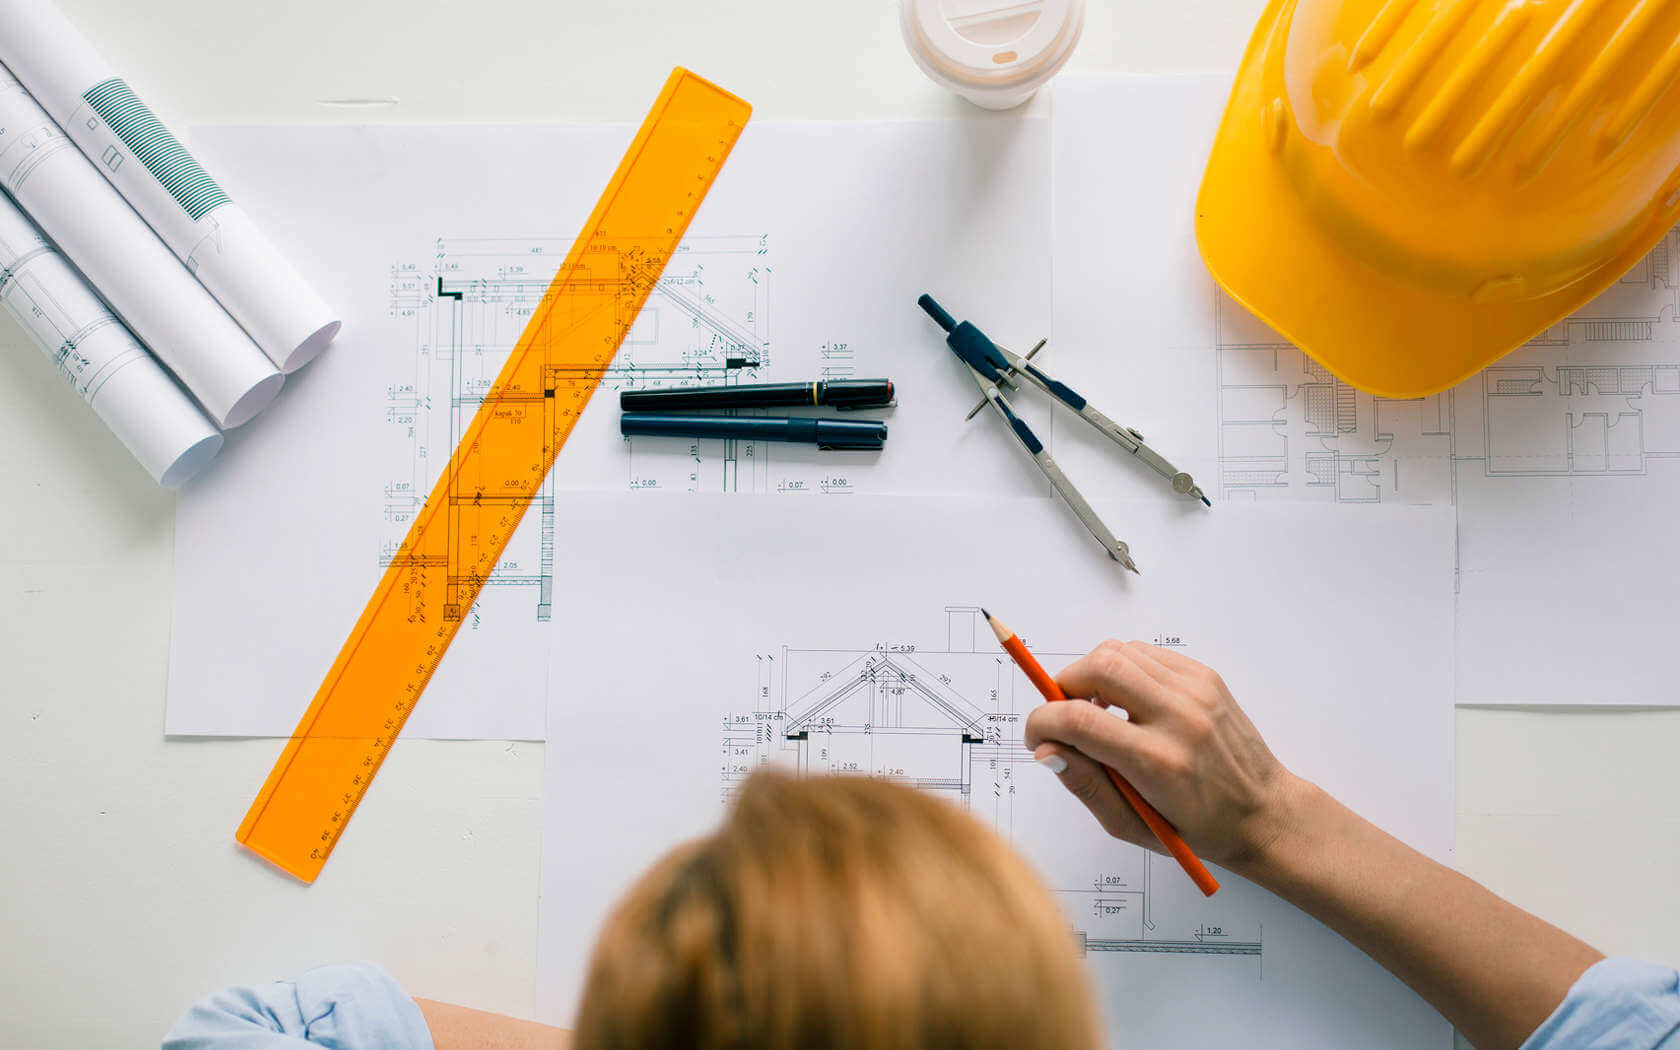 oferta dla konstruktora -  oferta_dla_konstruktora